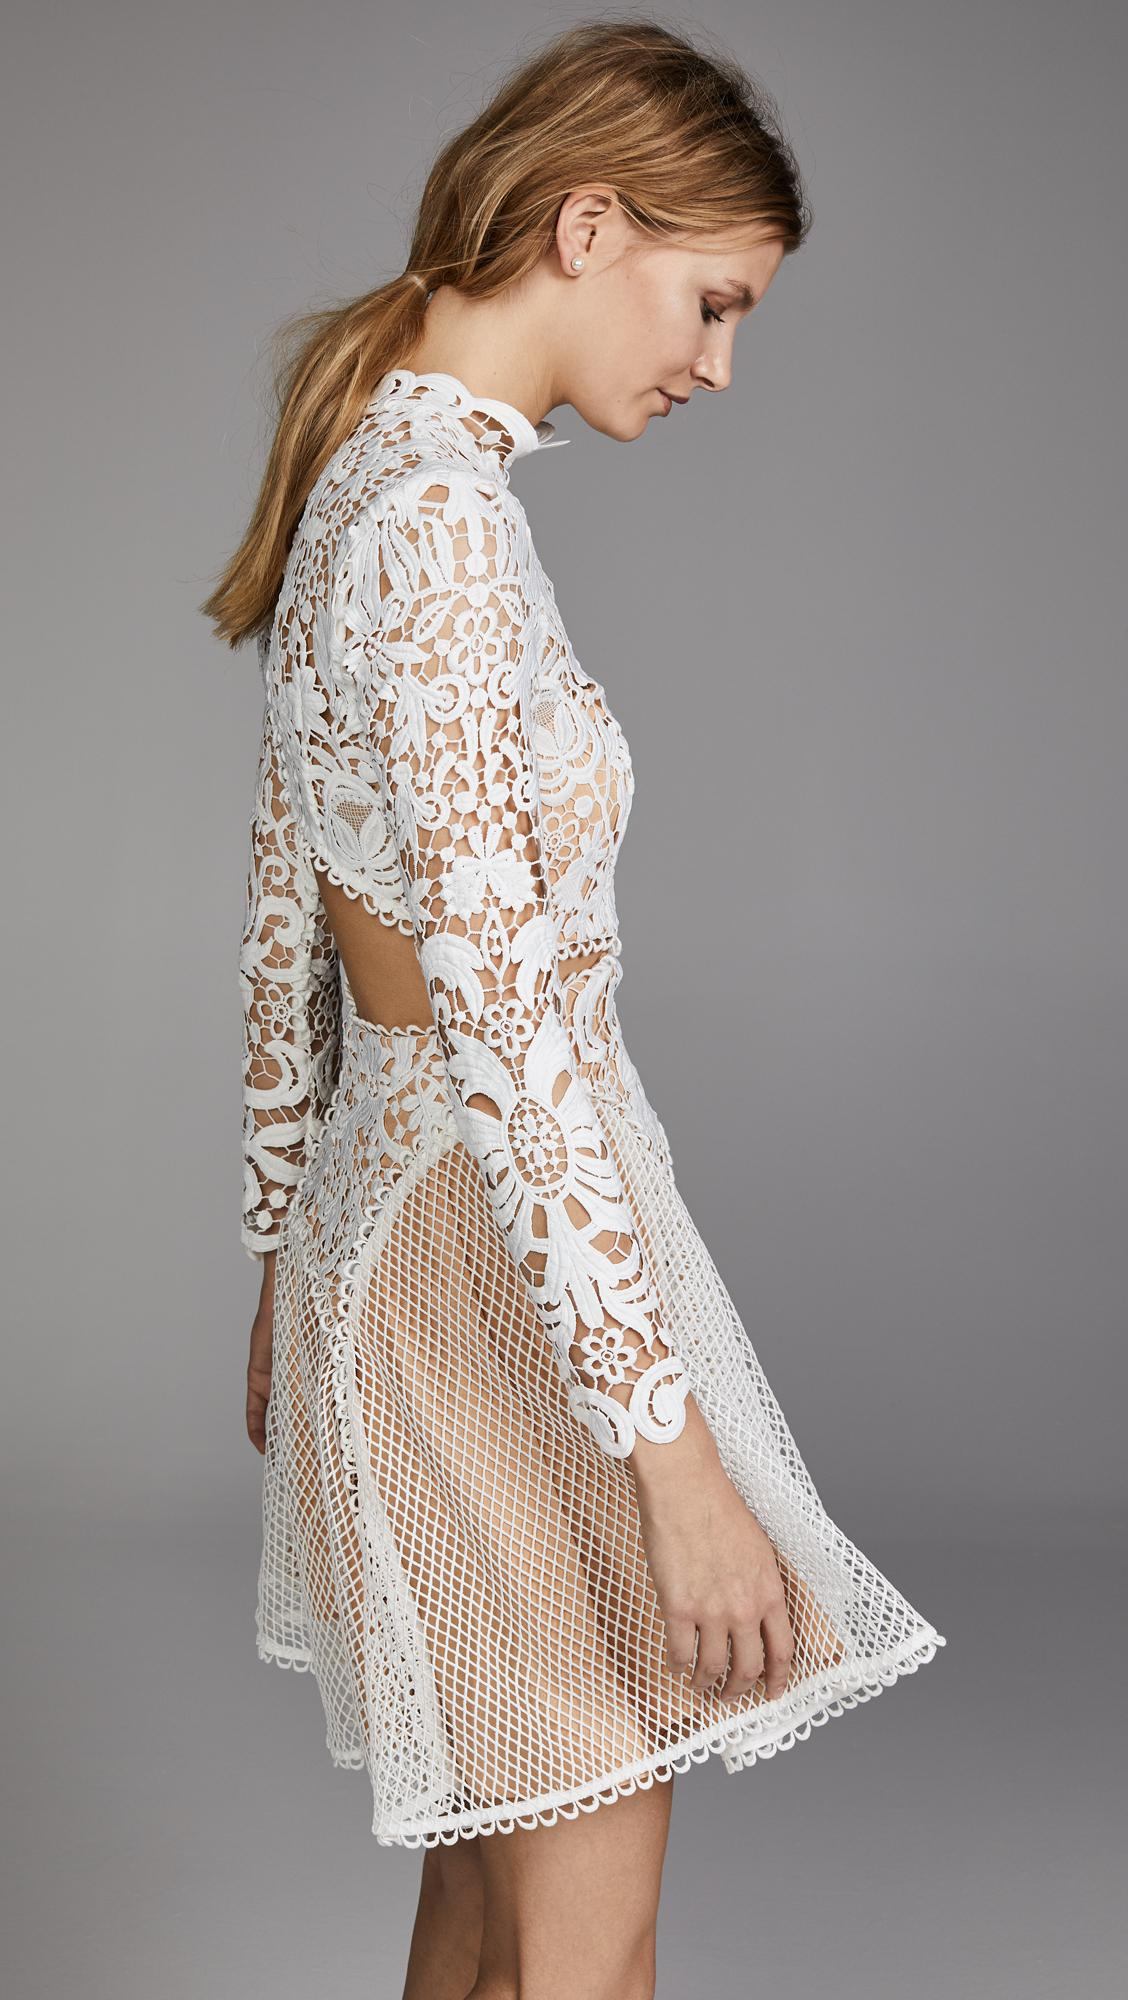 Thurley Tulle Enchanted Garden Mini Dress In White Lyst